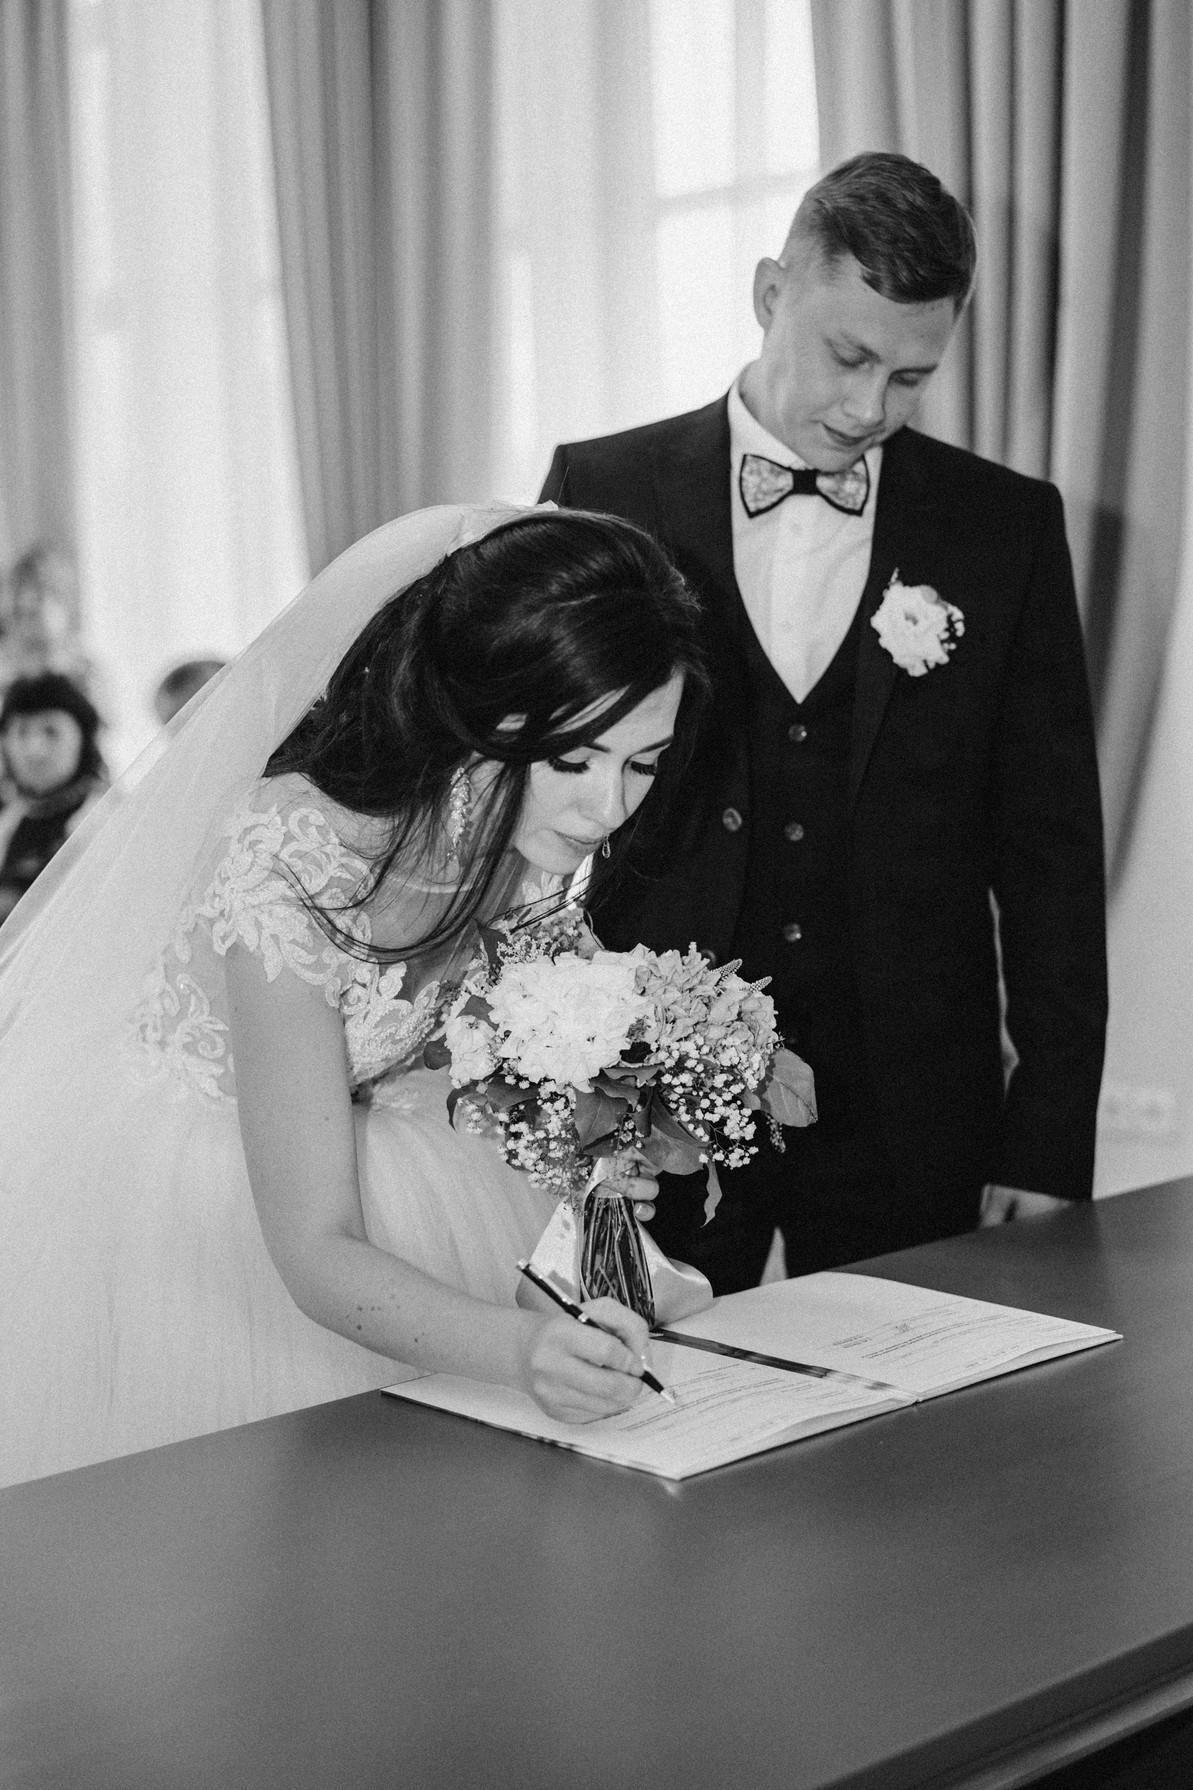 ArtSoul_Wedding_anons-105.jpg